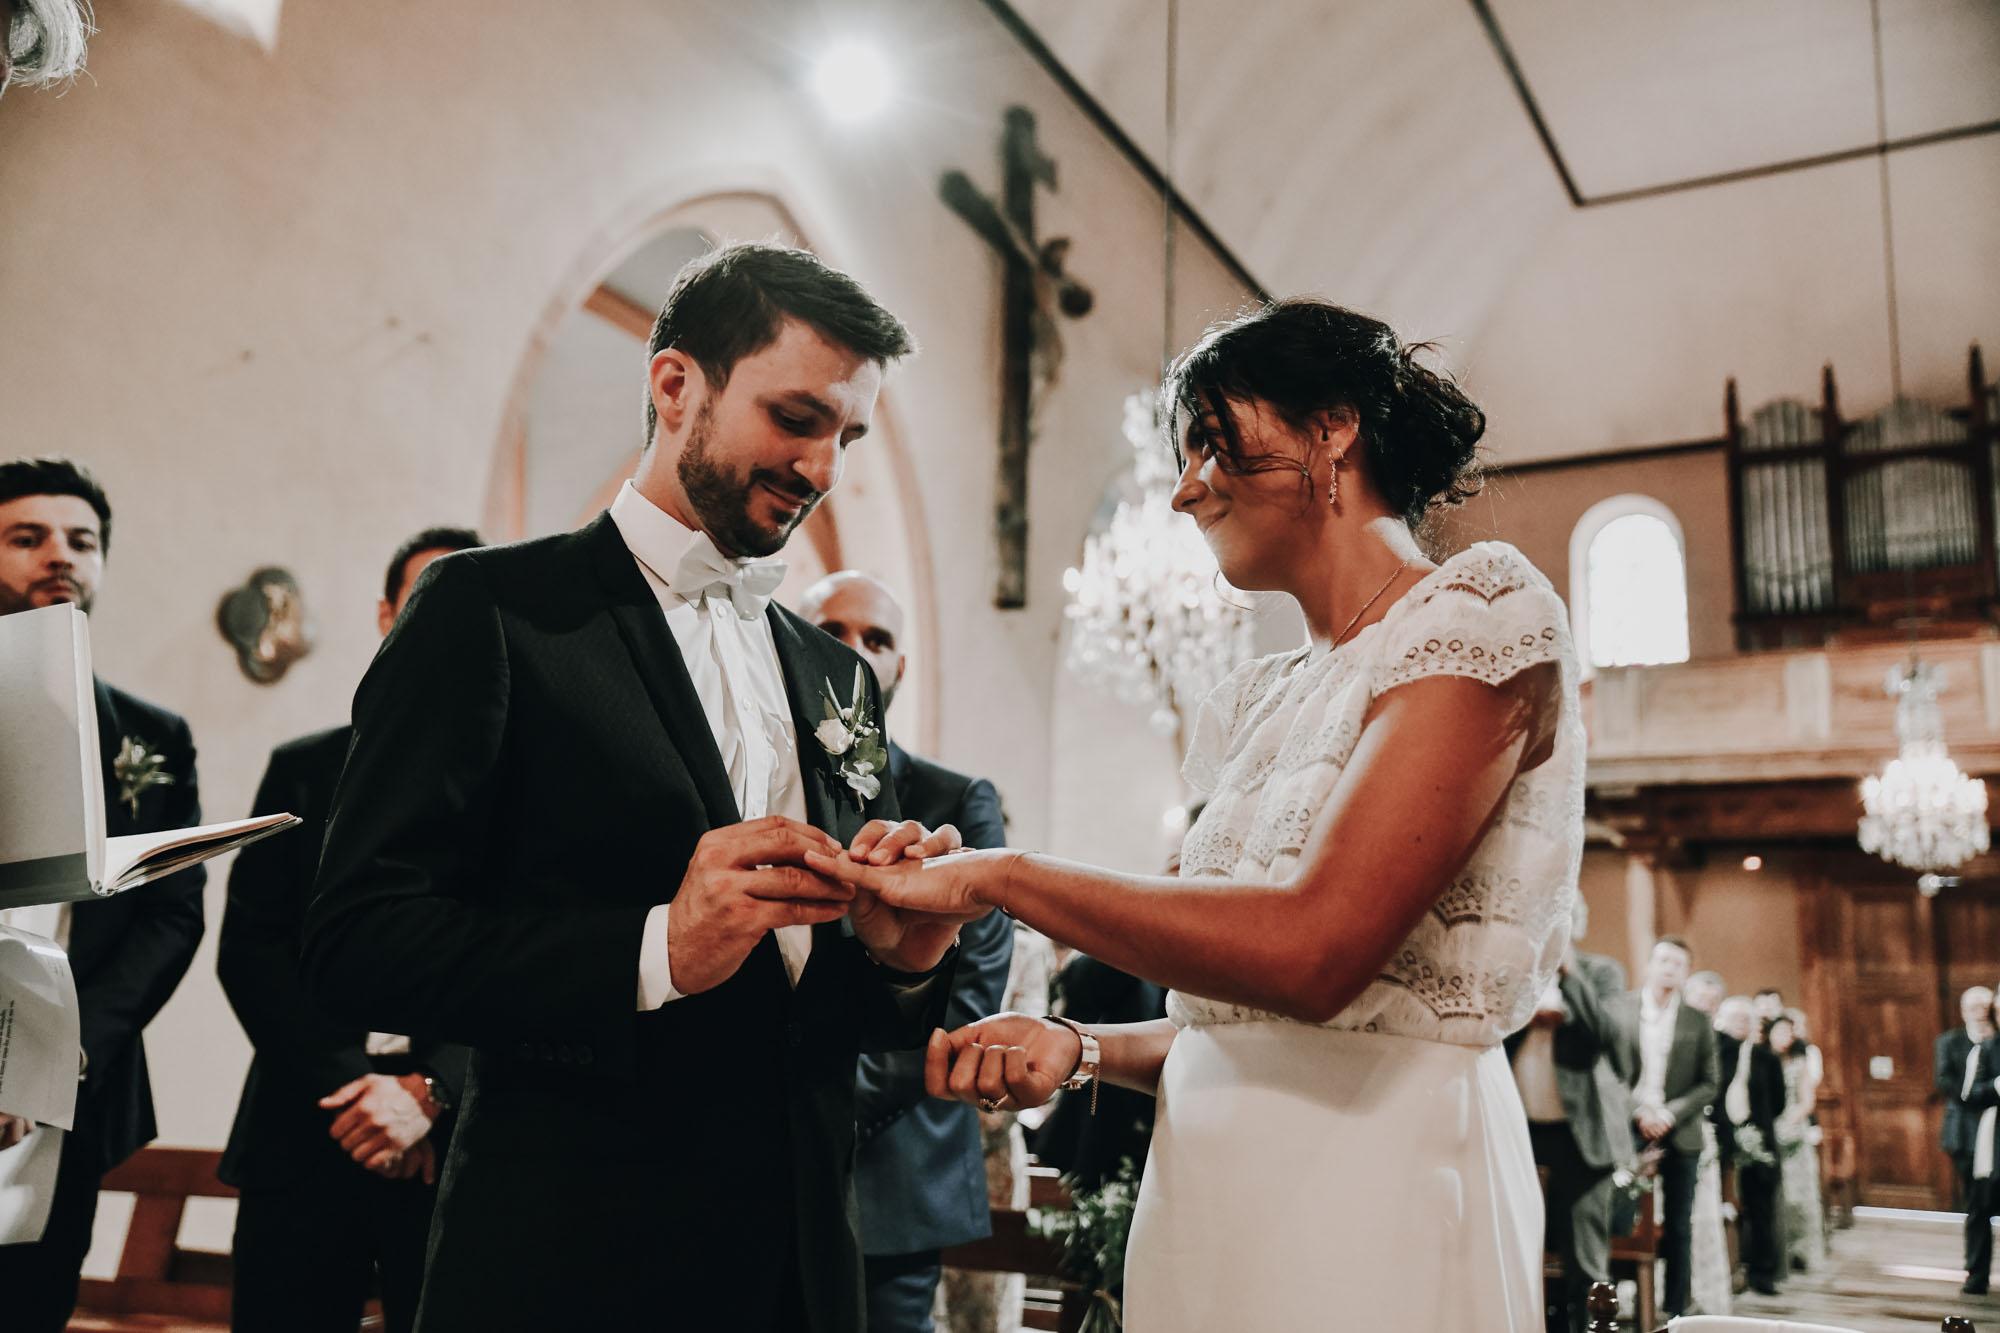 2018-09-08 - LD8_5524 - photographe mariage lyon - laurie diaz - www.lauriediazweeding.com.jpg